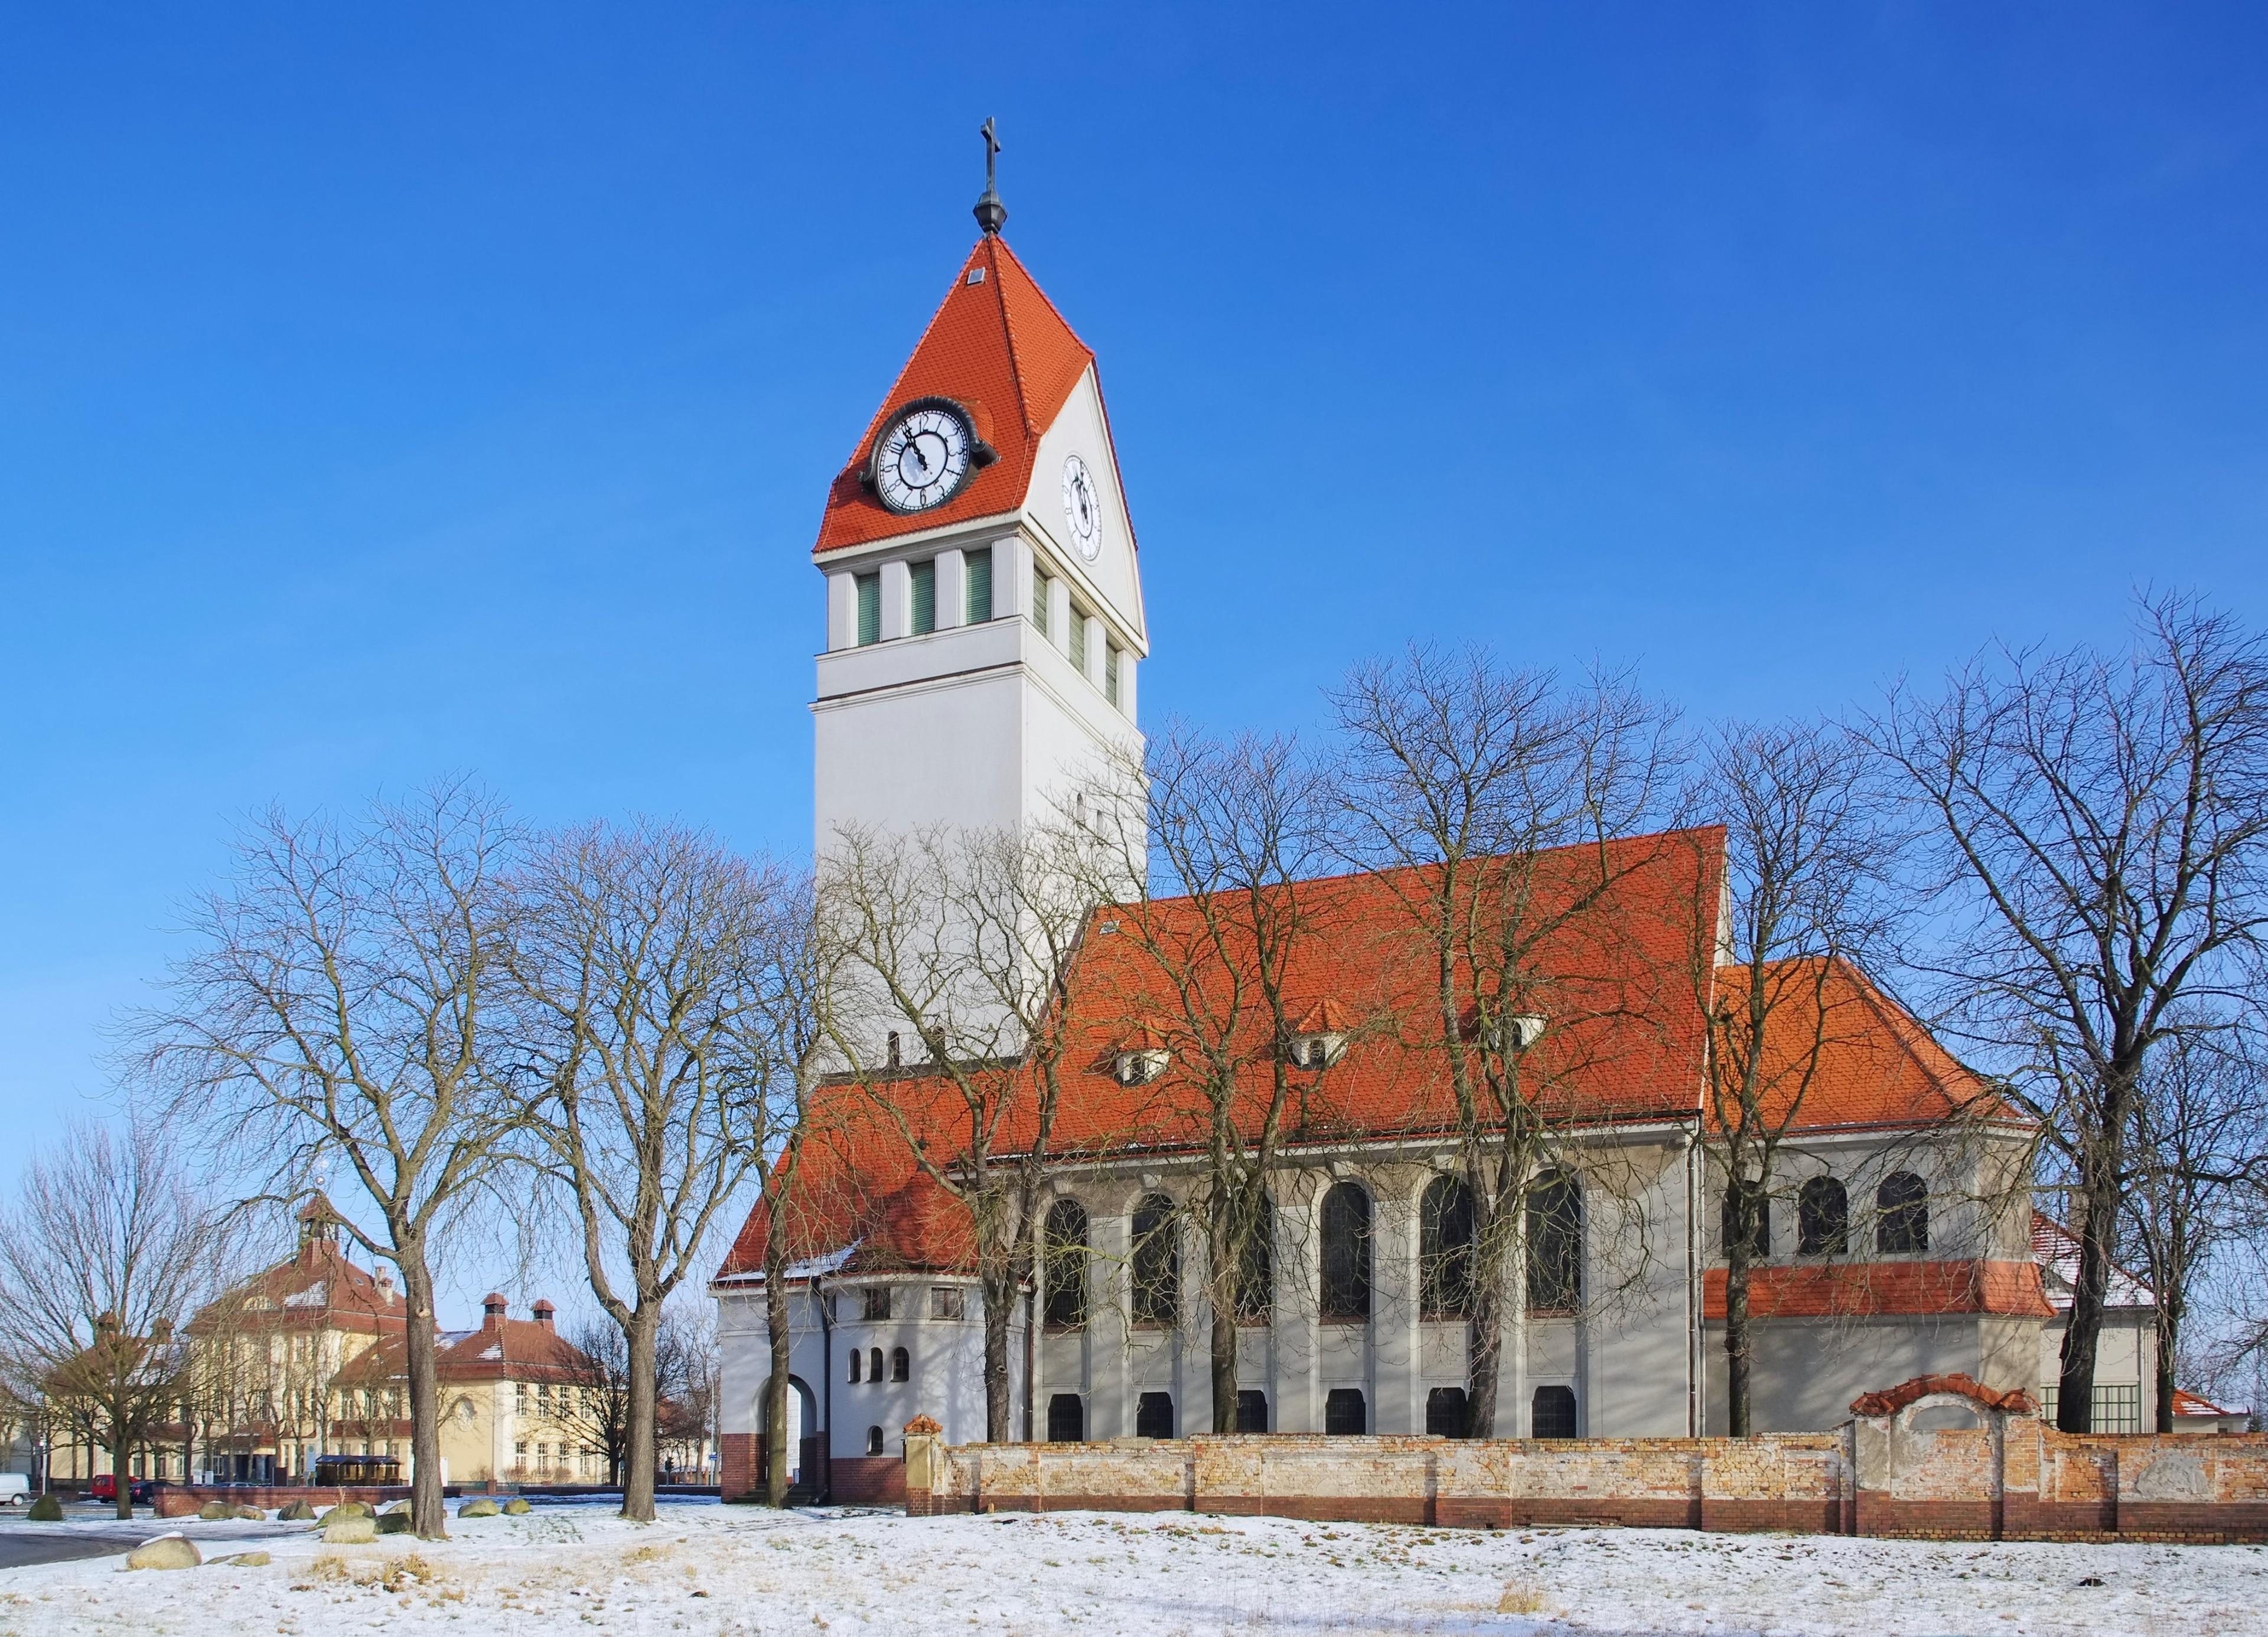 Oberspreewald-Lausitz District, Brandenburg Region, Germany